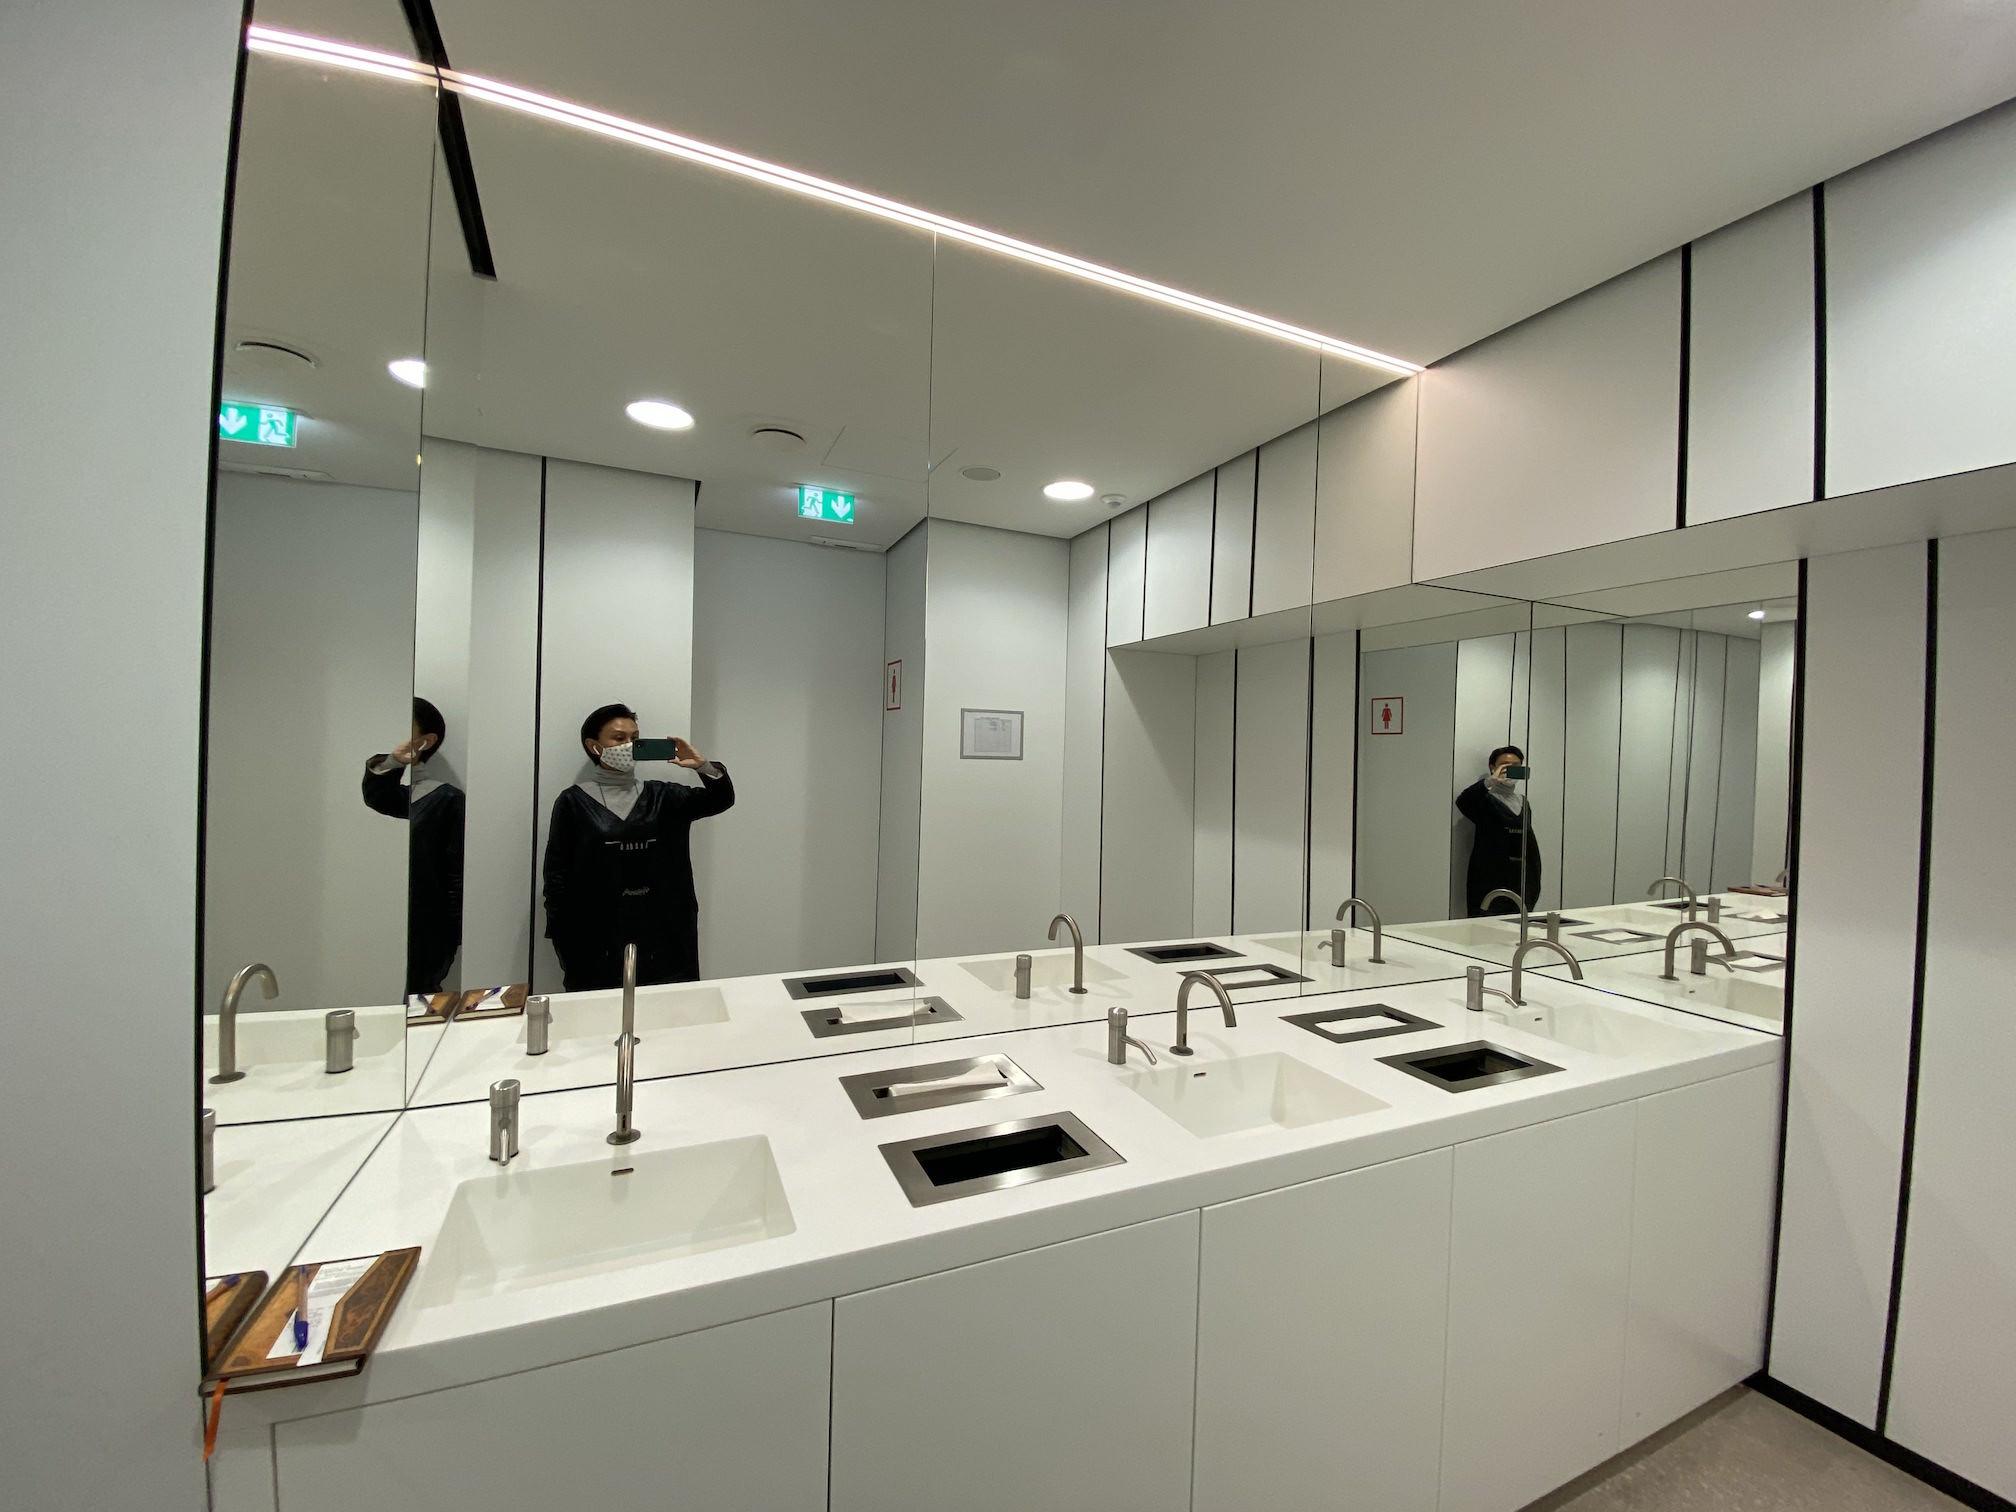 Albertina modern Toilette